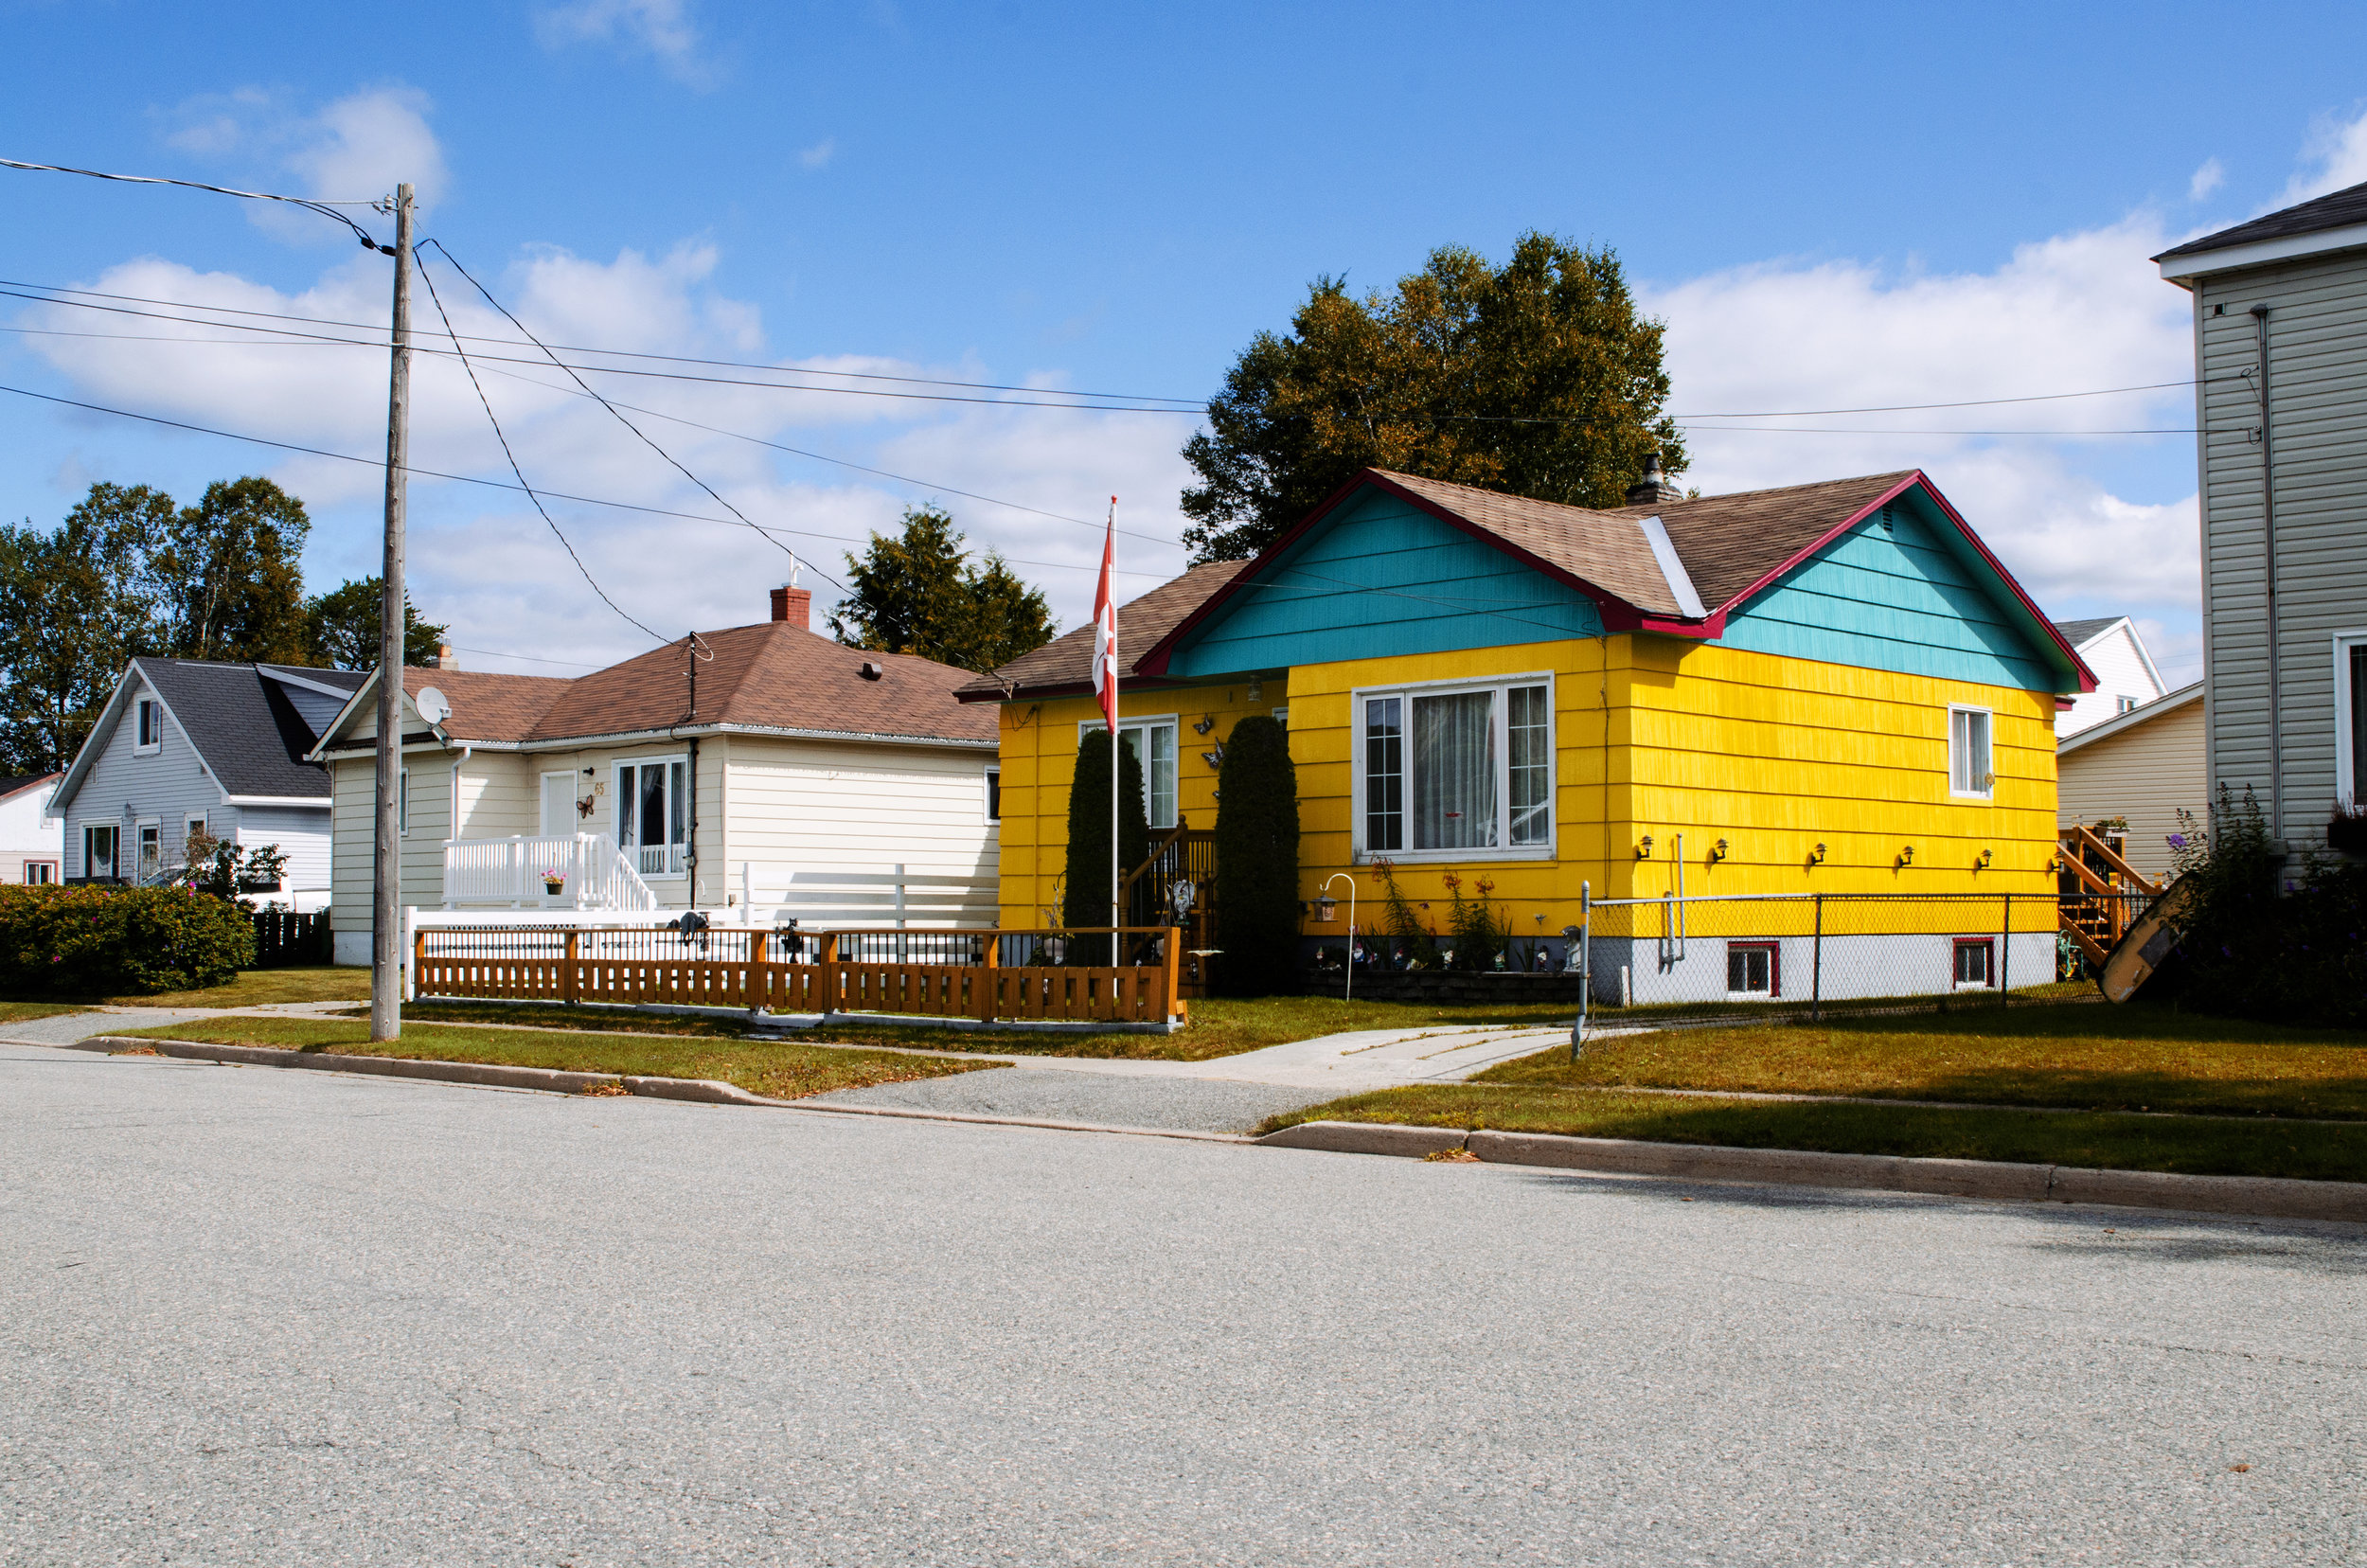 Jenkins, Cheyenne. Yellow House. 2017. Digital Photography. Wawa, Ontario